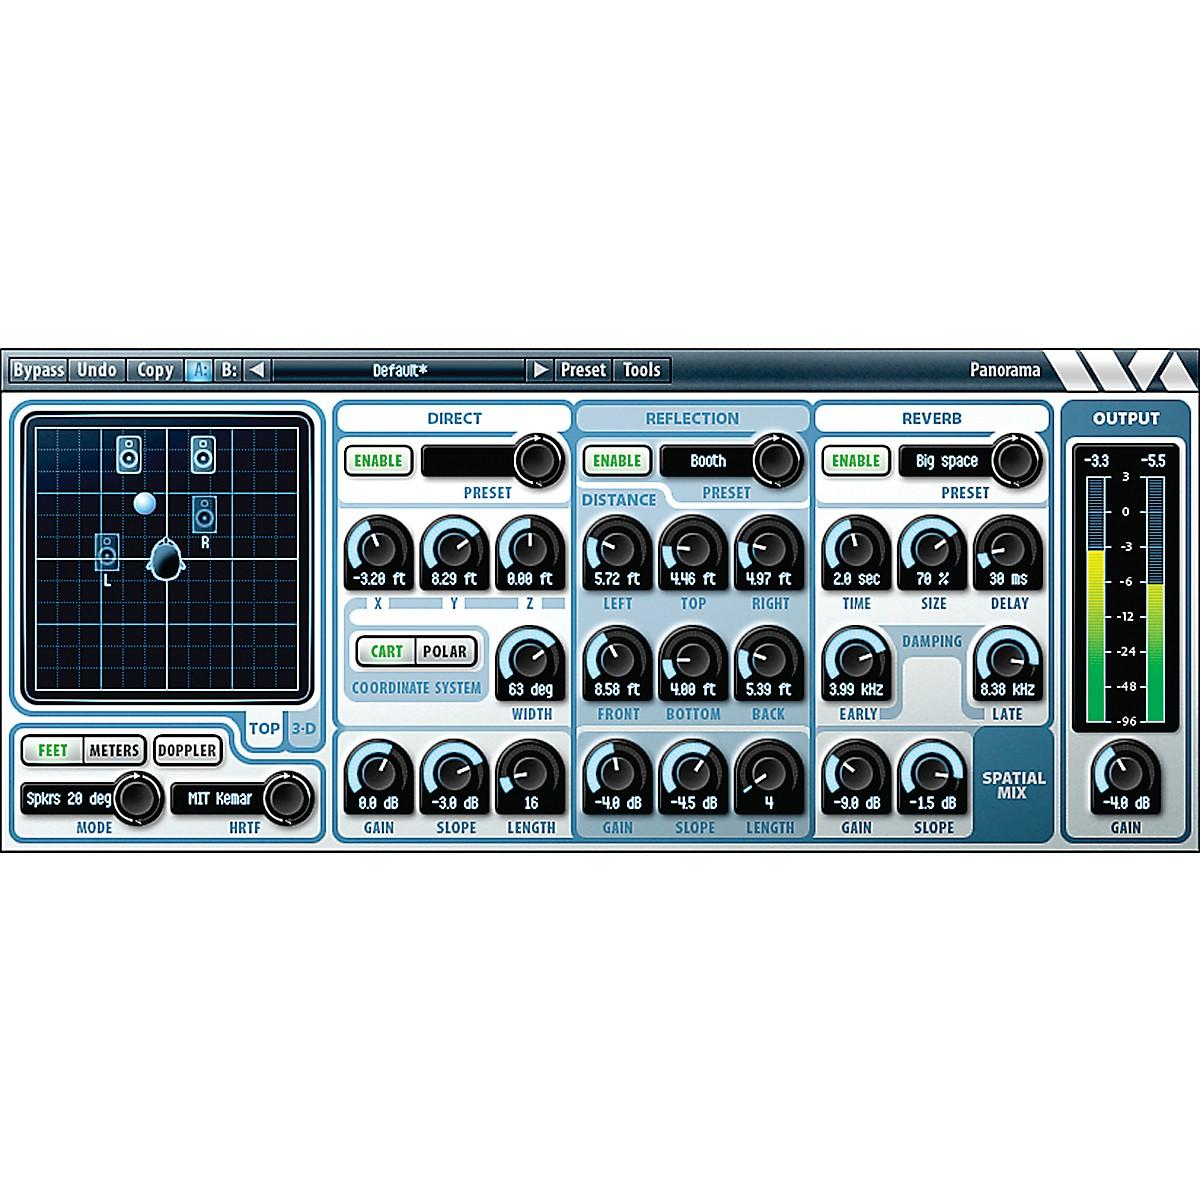 Wave Arts Panorama 5 Software Download